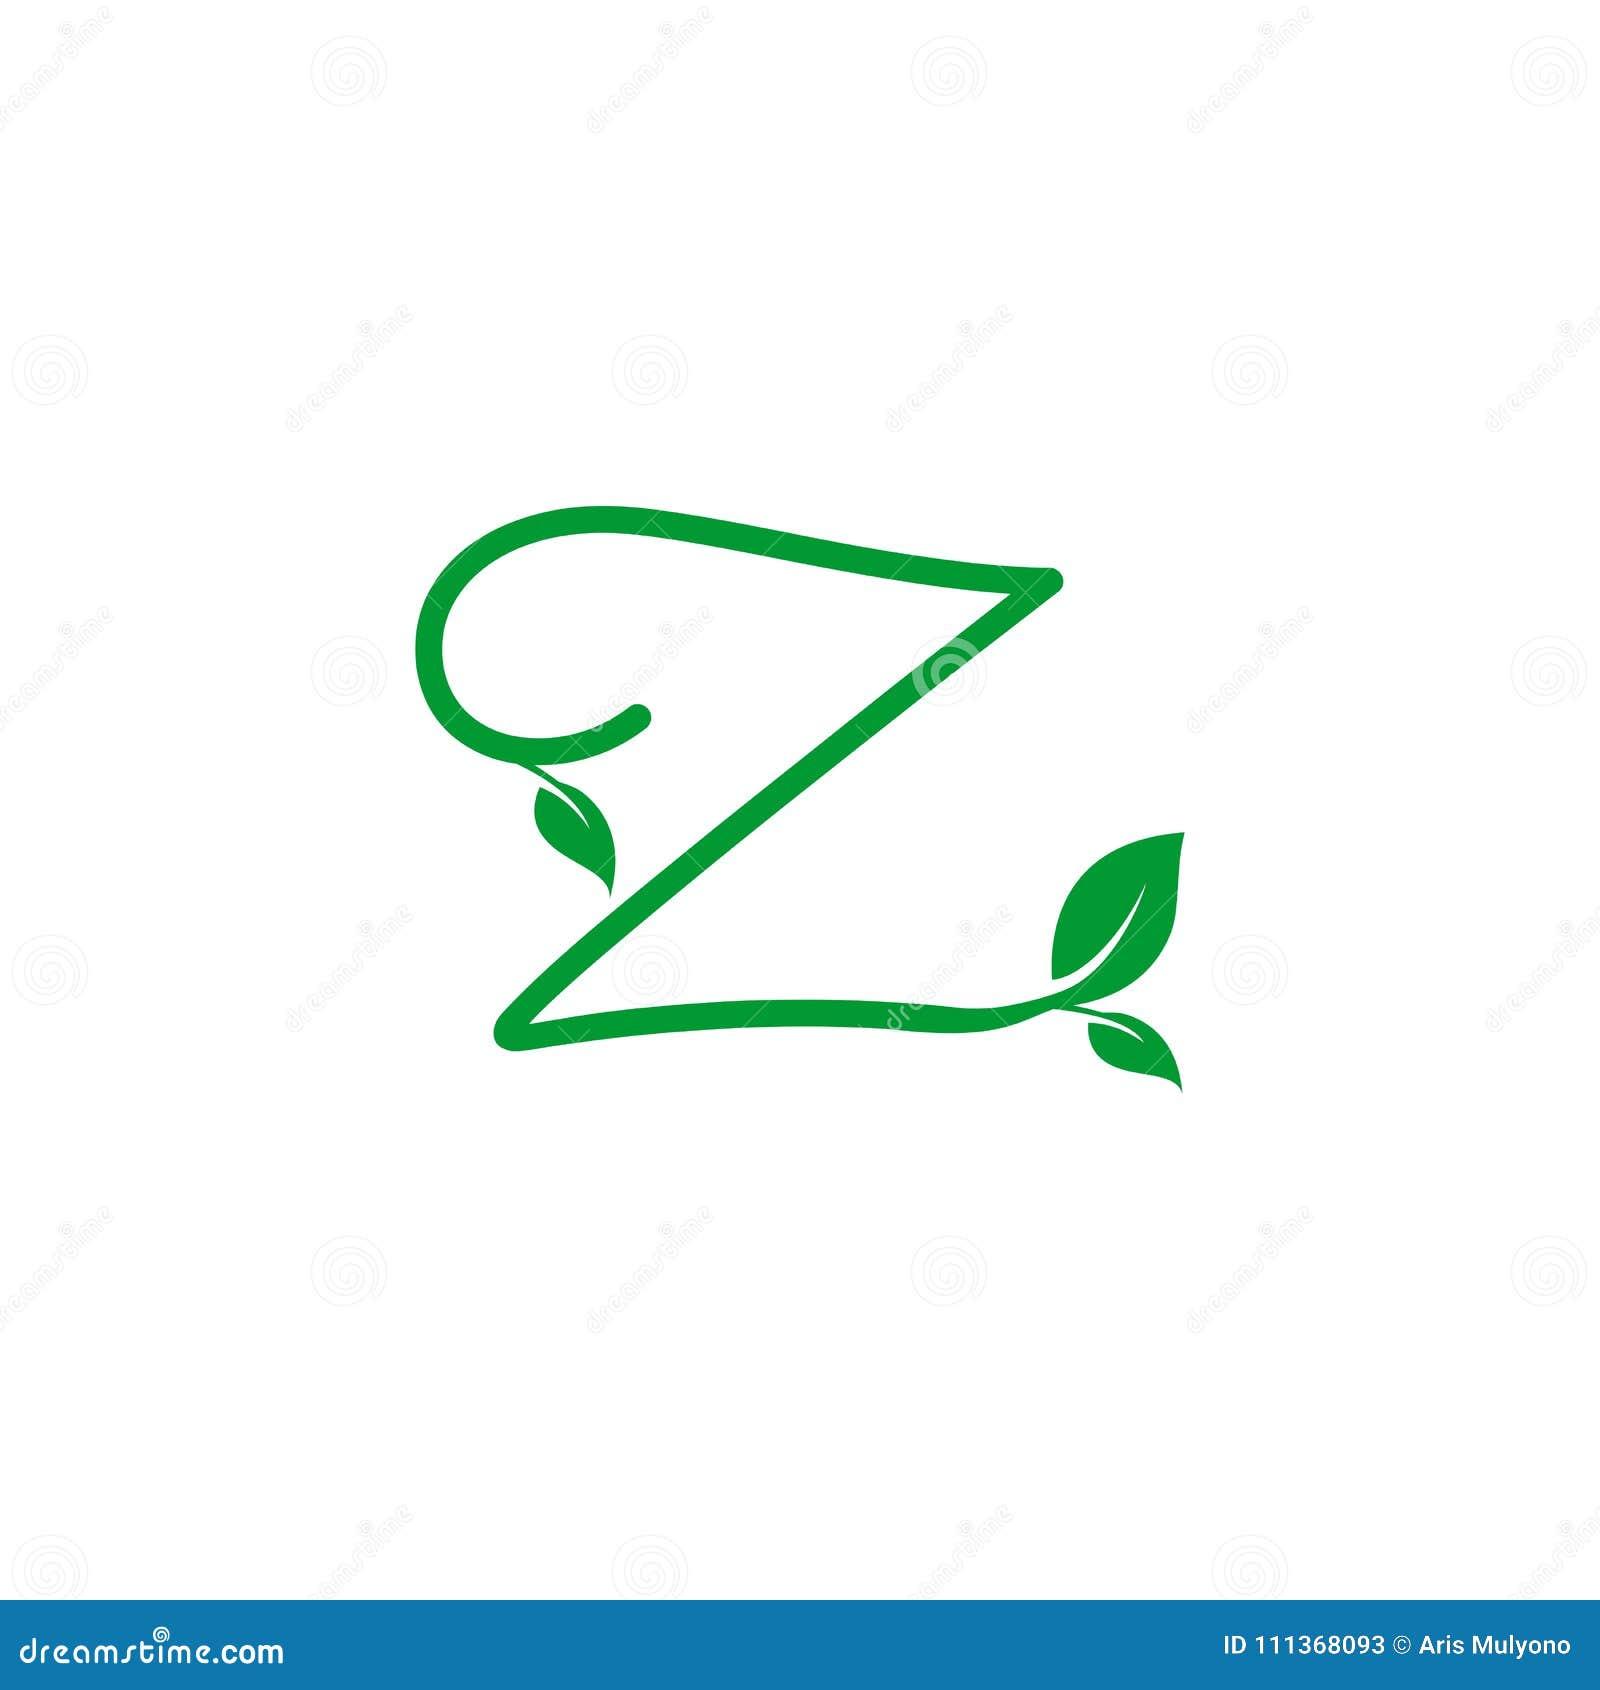 Leaf Initials Logo Concept Stock Illustration Illustration Of